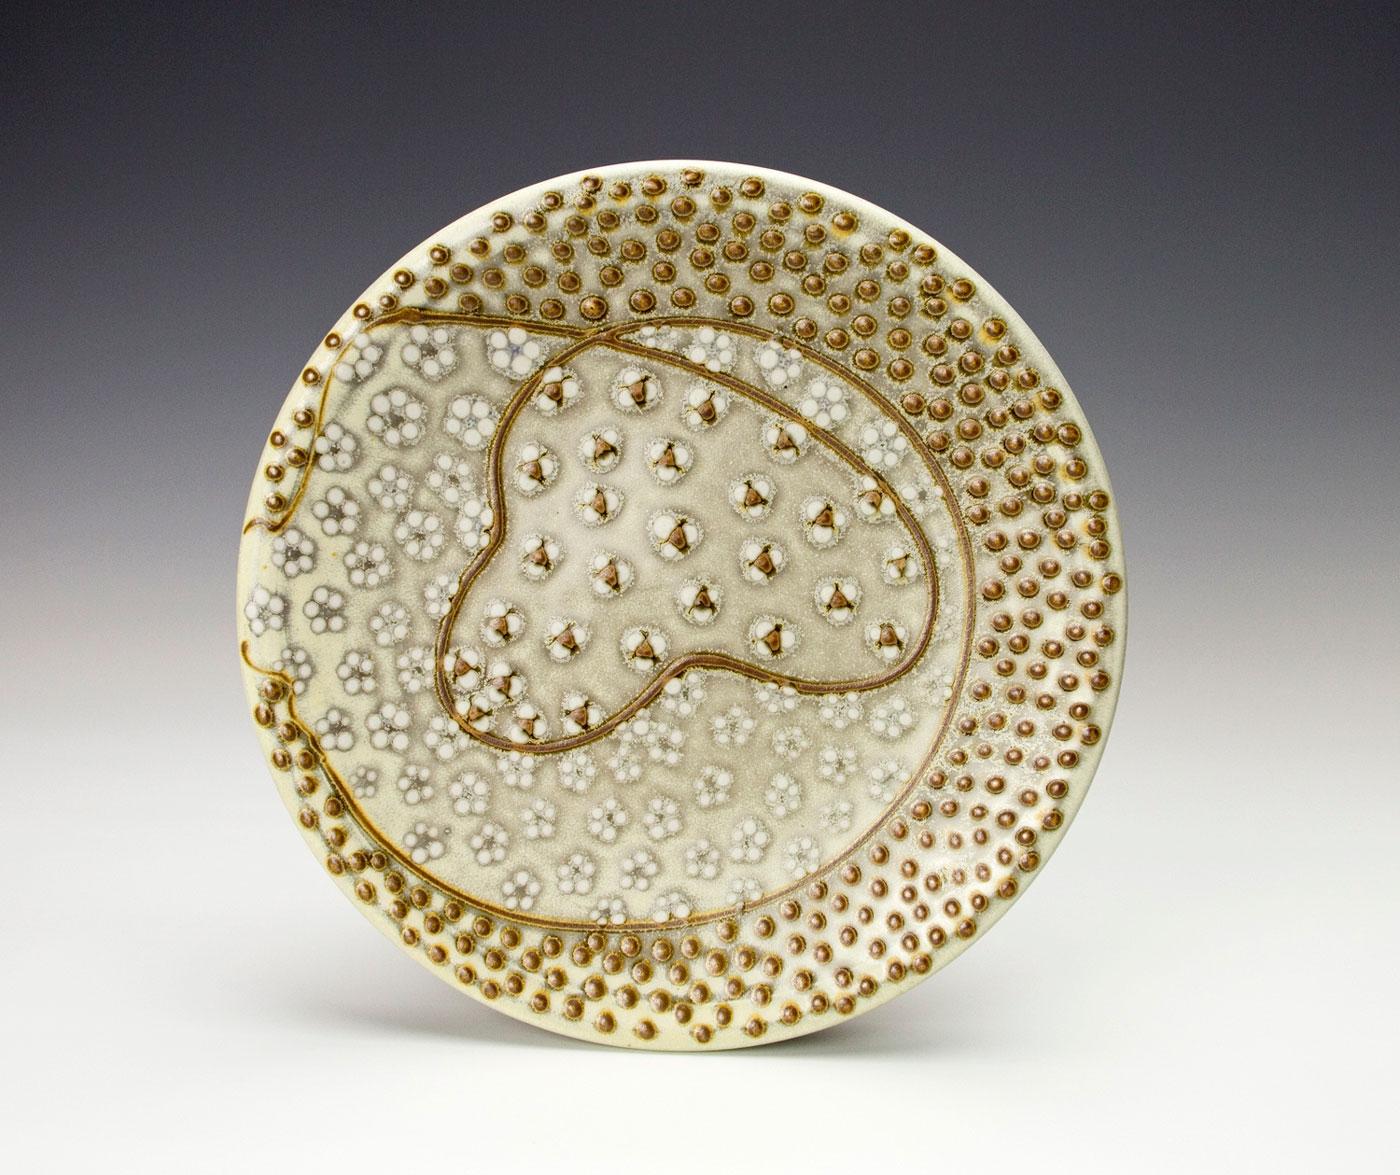 Pattern-medley-dinner-pottery-plate-dots-lines-Samantha-Henneke.jpg